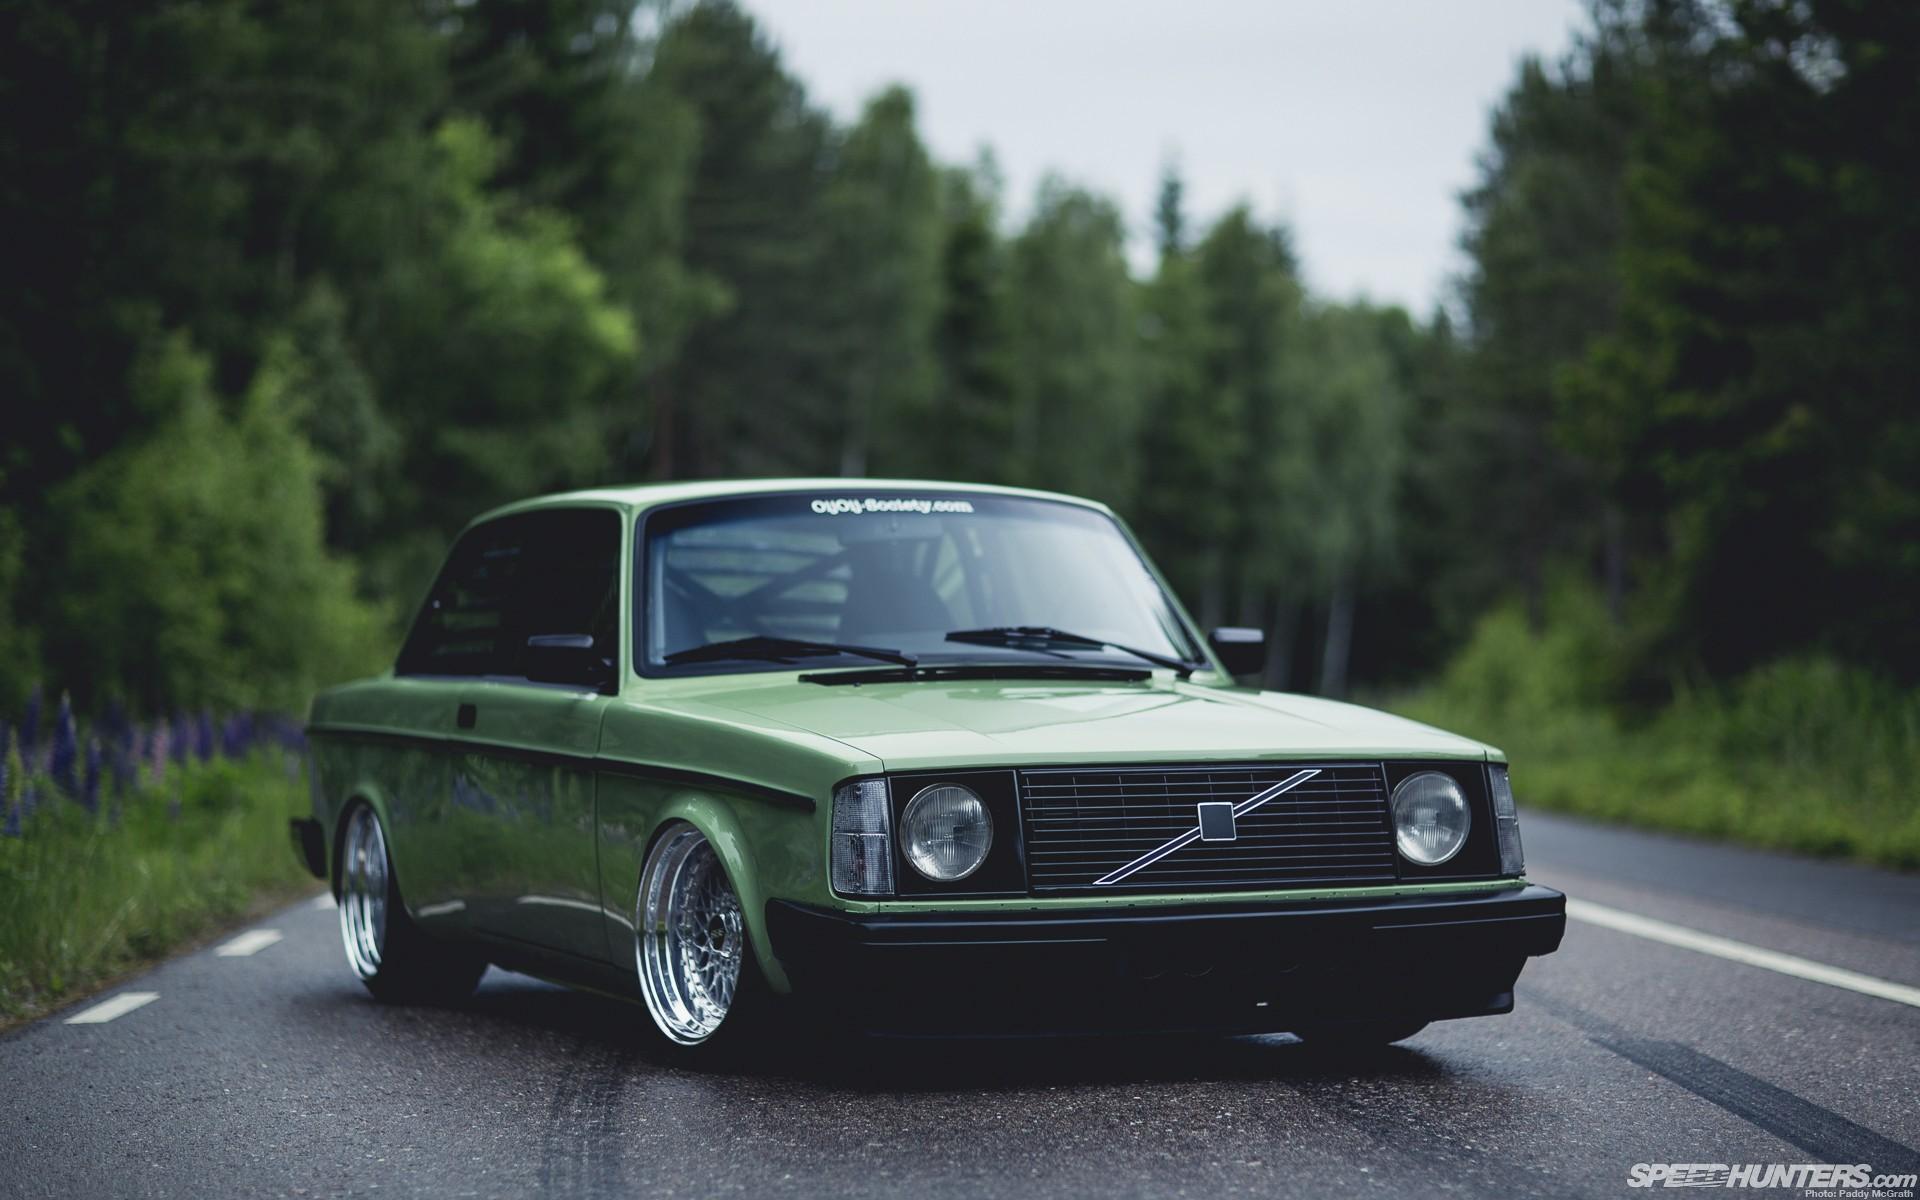 Volvo 240 wallpaper